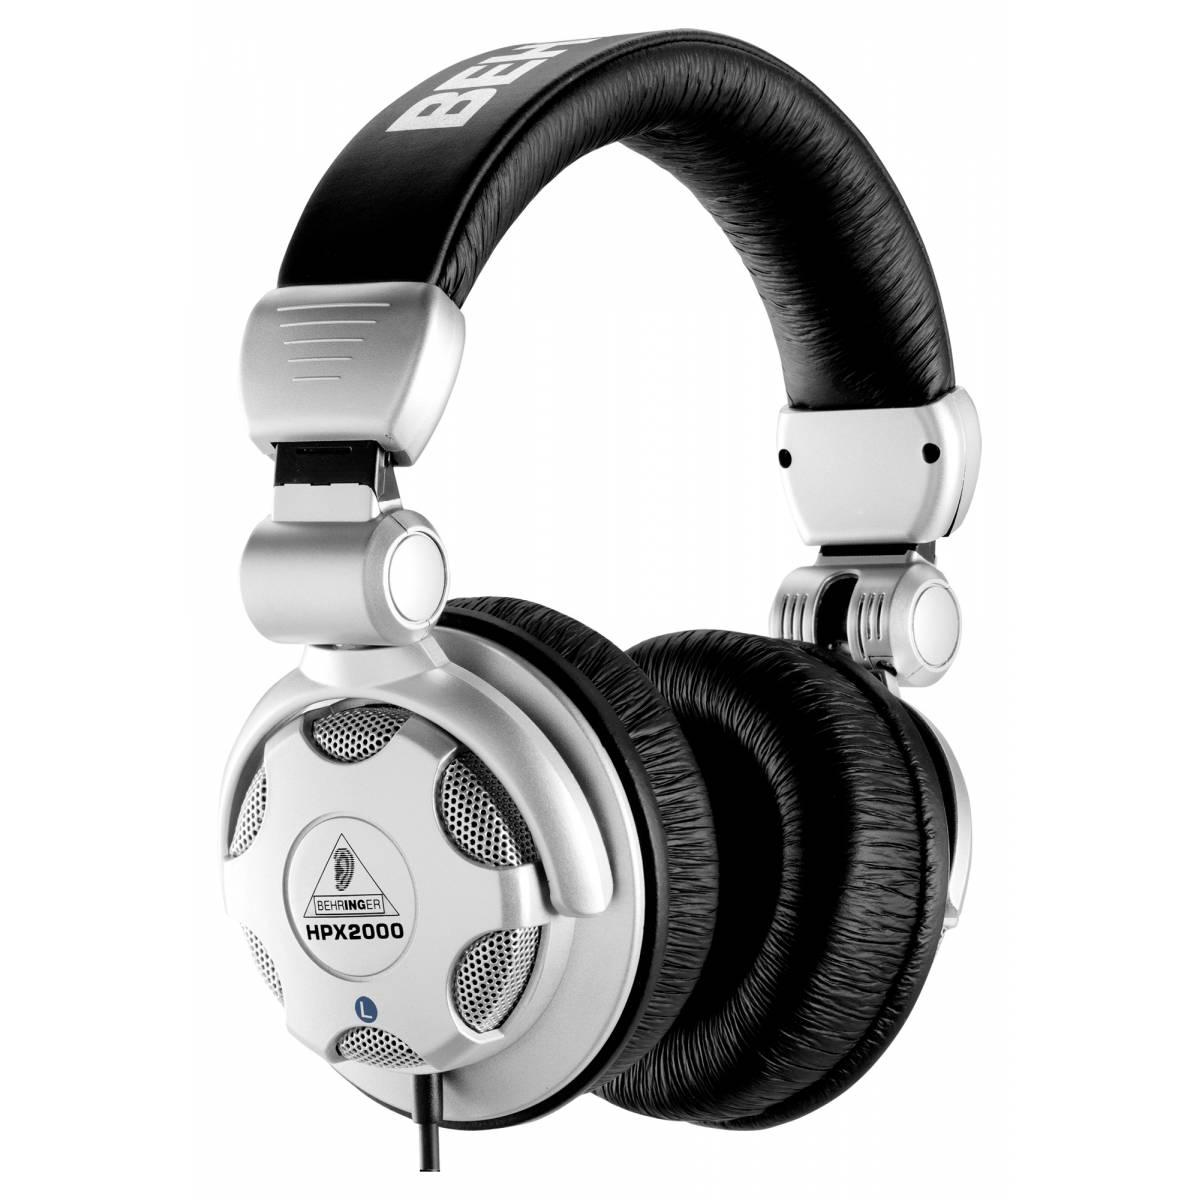 behringer hpx2000 studio headphones monitoring from inta audio uk. Black Bedroom Furniture Sets. Home Design Ideas